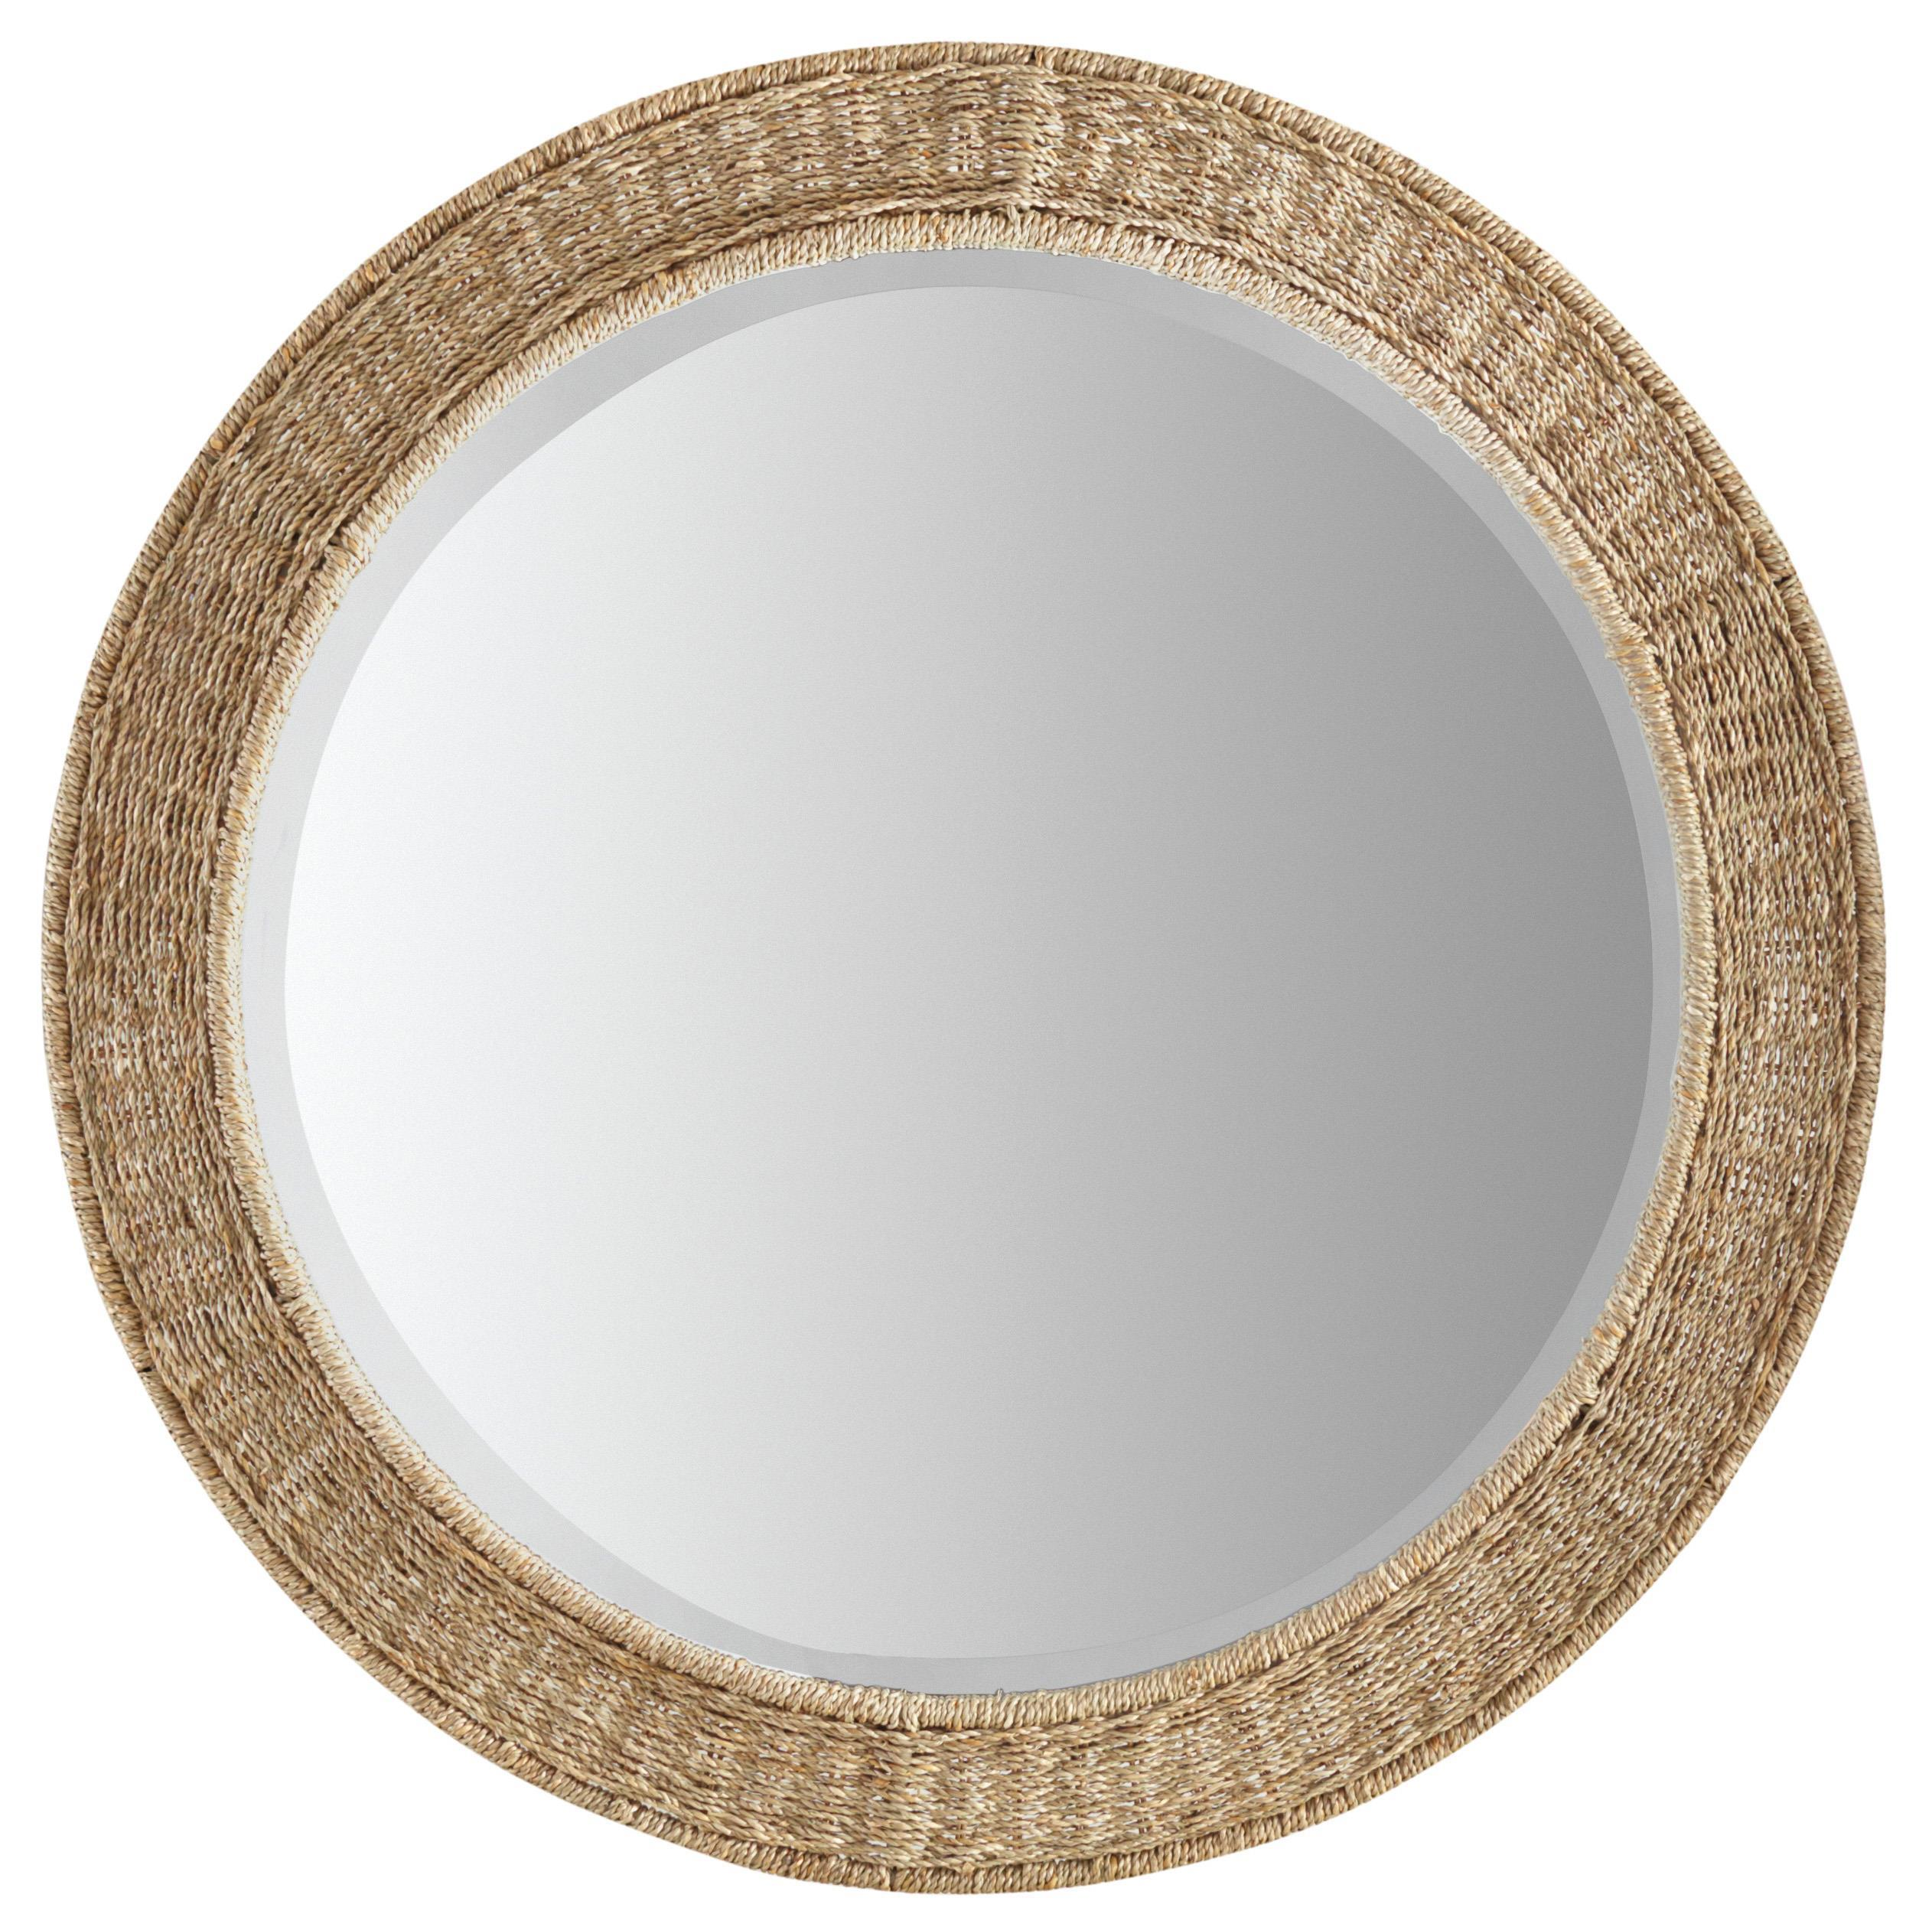 Hooker Furniture Studio 7H Harmony Round Rope Mirror - Item Number: 5382-90007